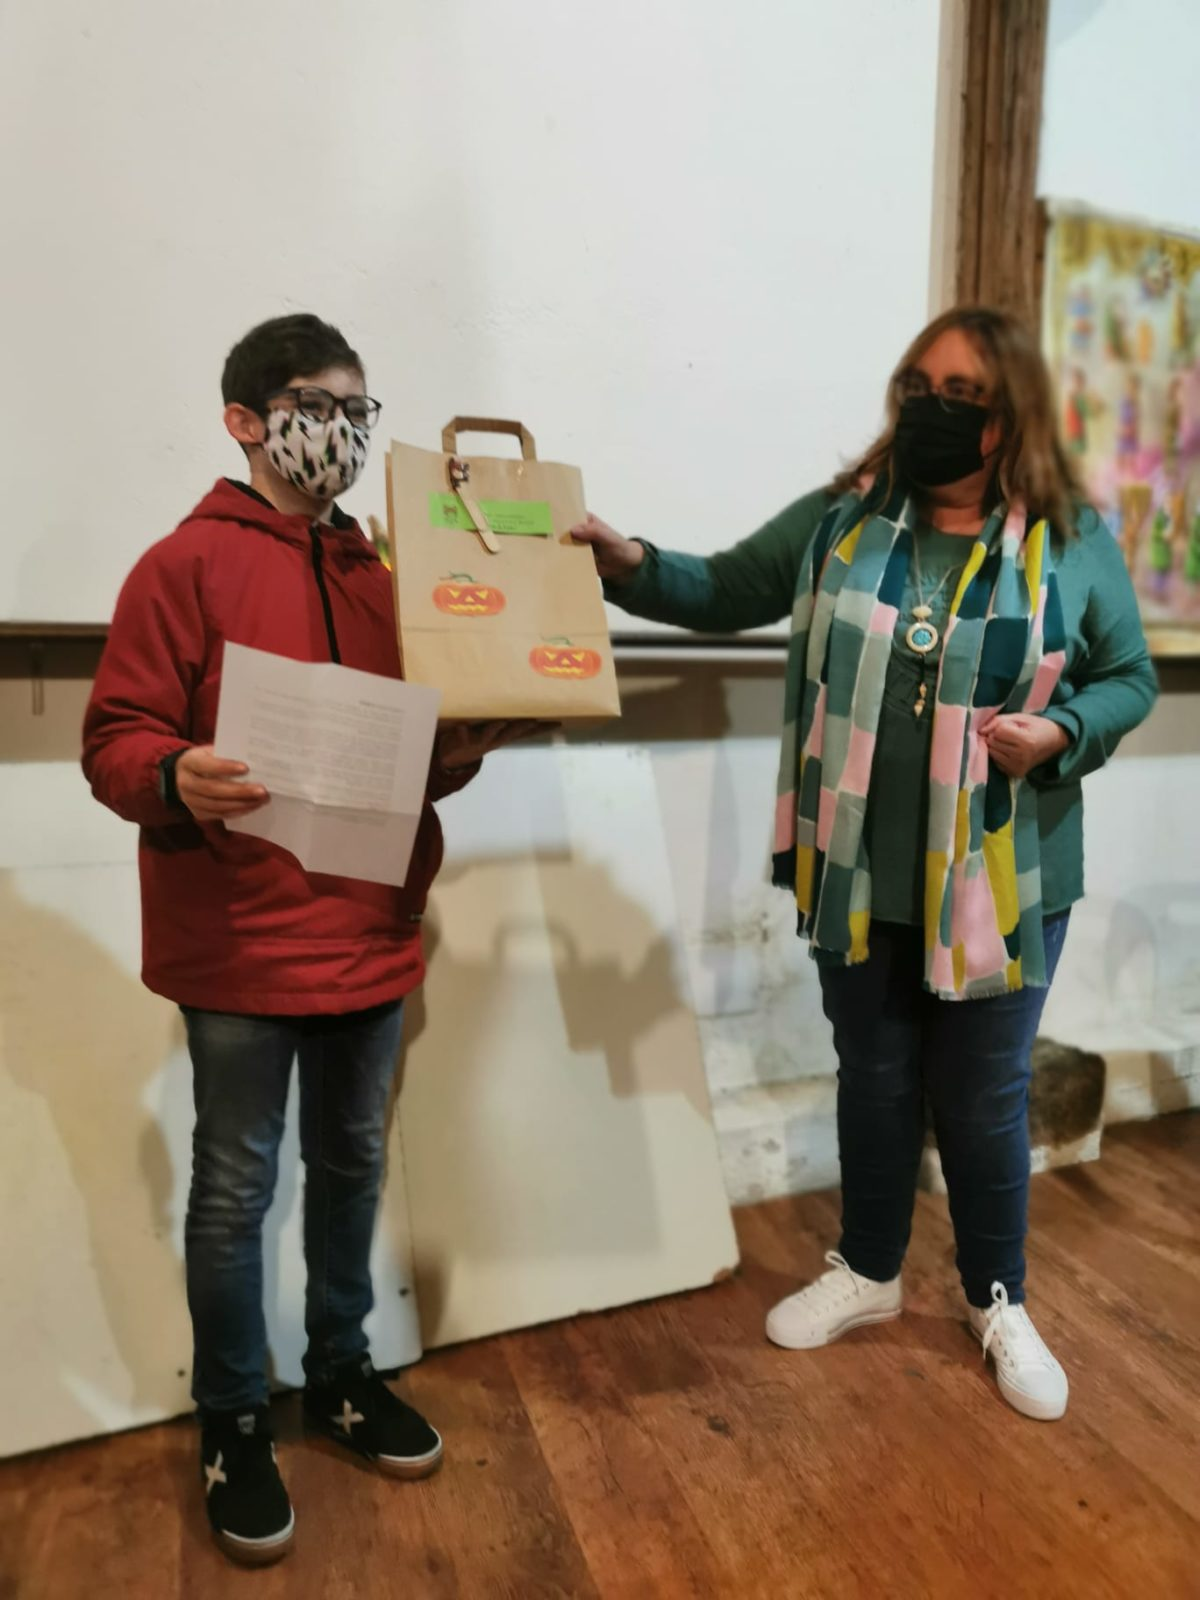 Samain 2020: Alfonso Regueiro e Xabier Gayoso premiados no I Concurso Relato Curto Lar de Unta